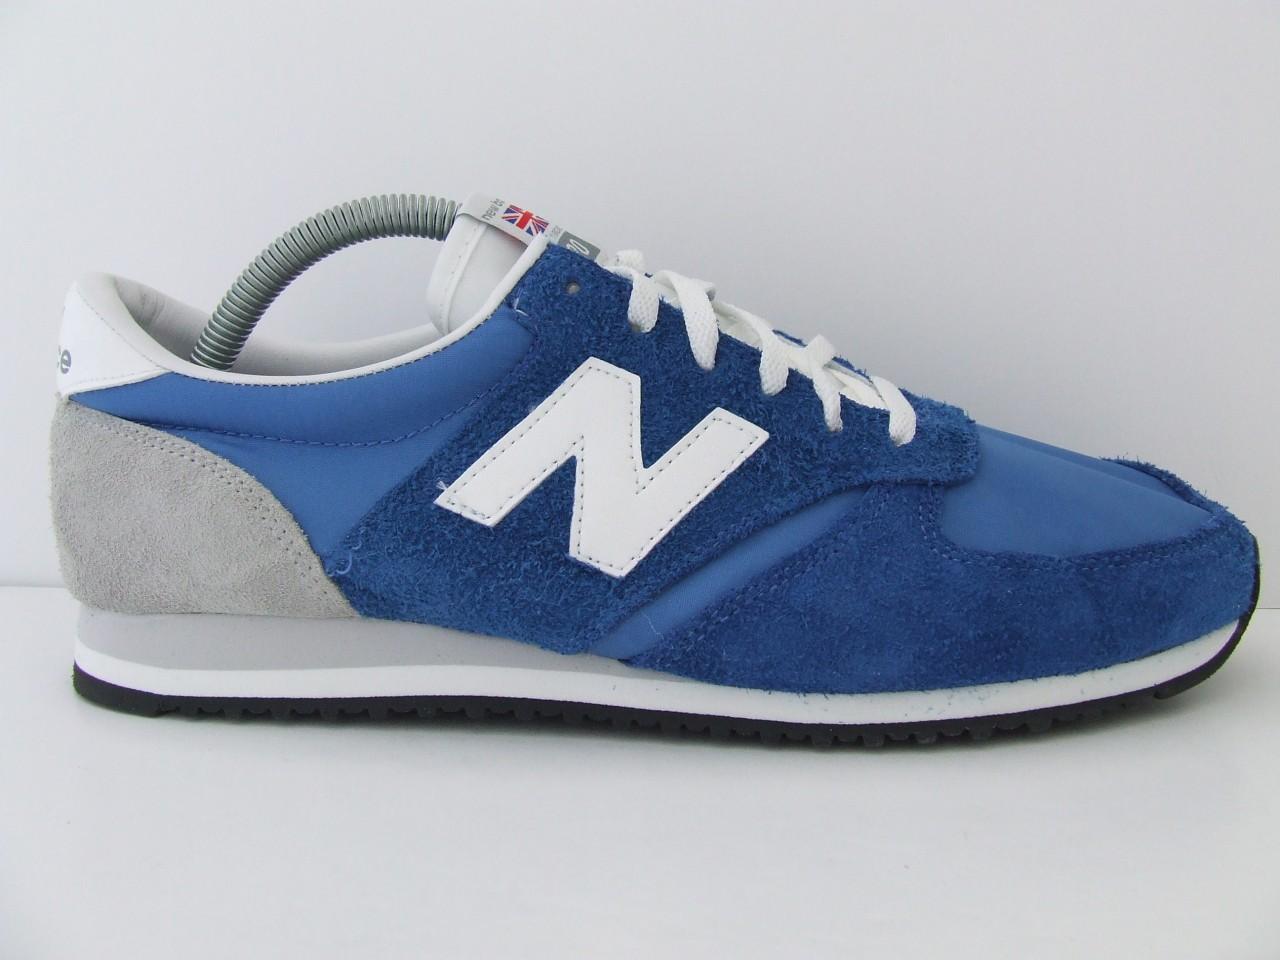 Unisex New Balance Trainers U420UB Blue & White Retro Suede Nylon Sneakers Shoes